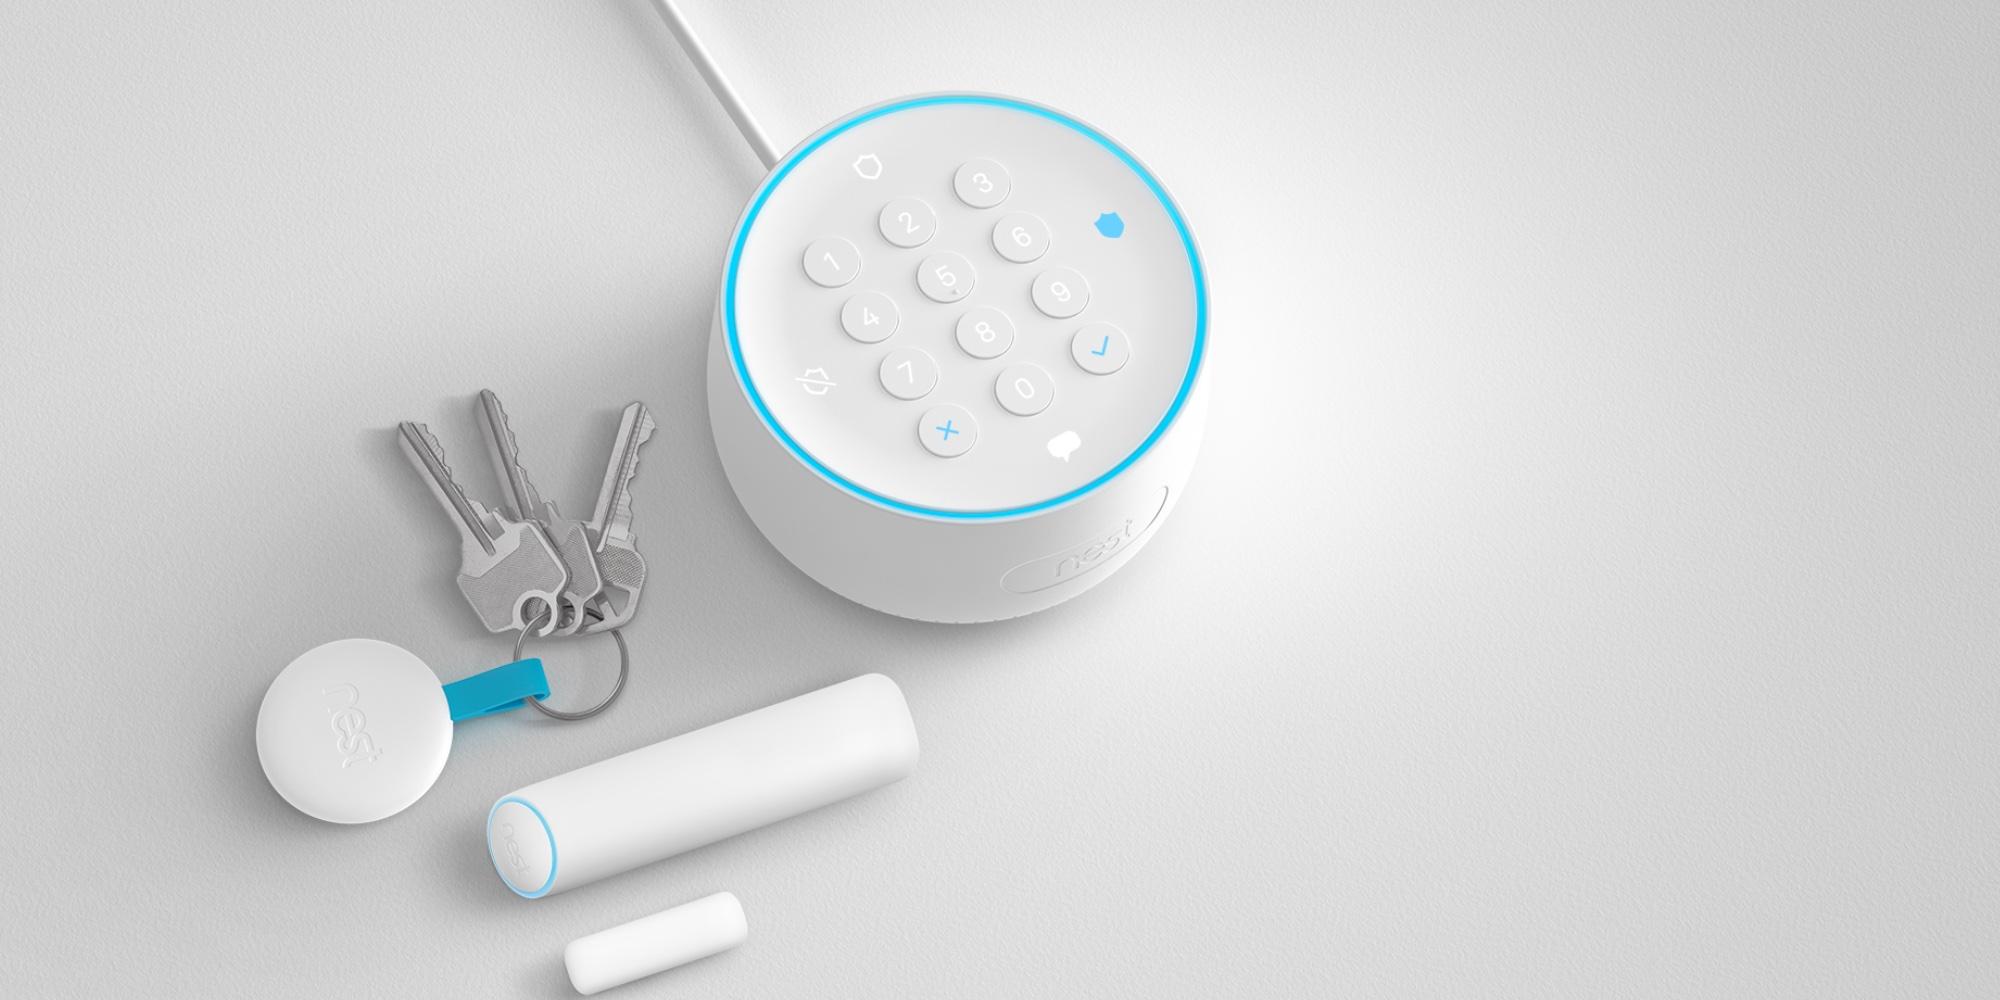 Nest Secure Alarm Starter Pack